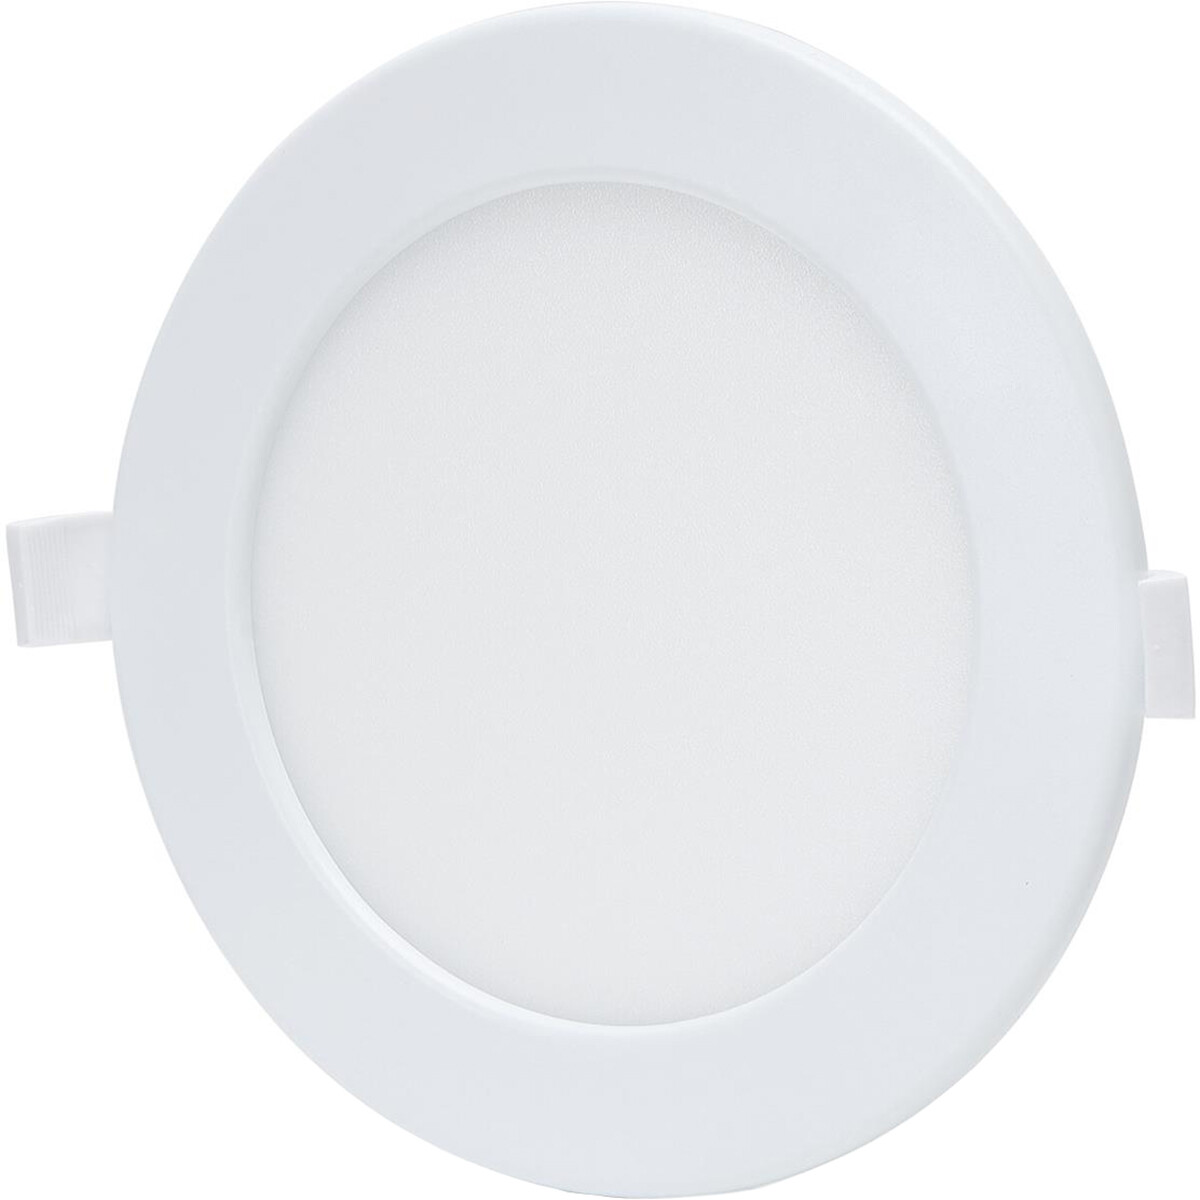 LED Downlight - Smart LED - Aigi Zumba - 12W - Aanpasbare Kleur - Inbouw Rond - Mat Wit - Aluminium